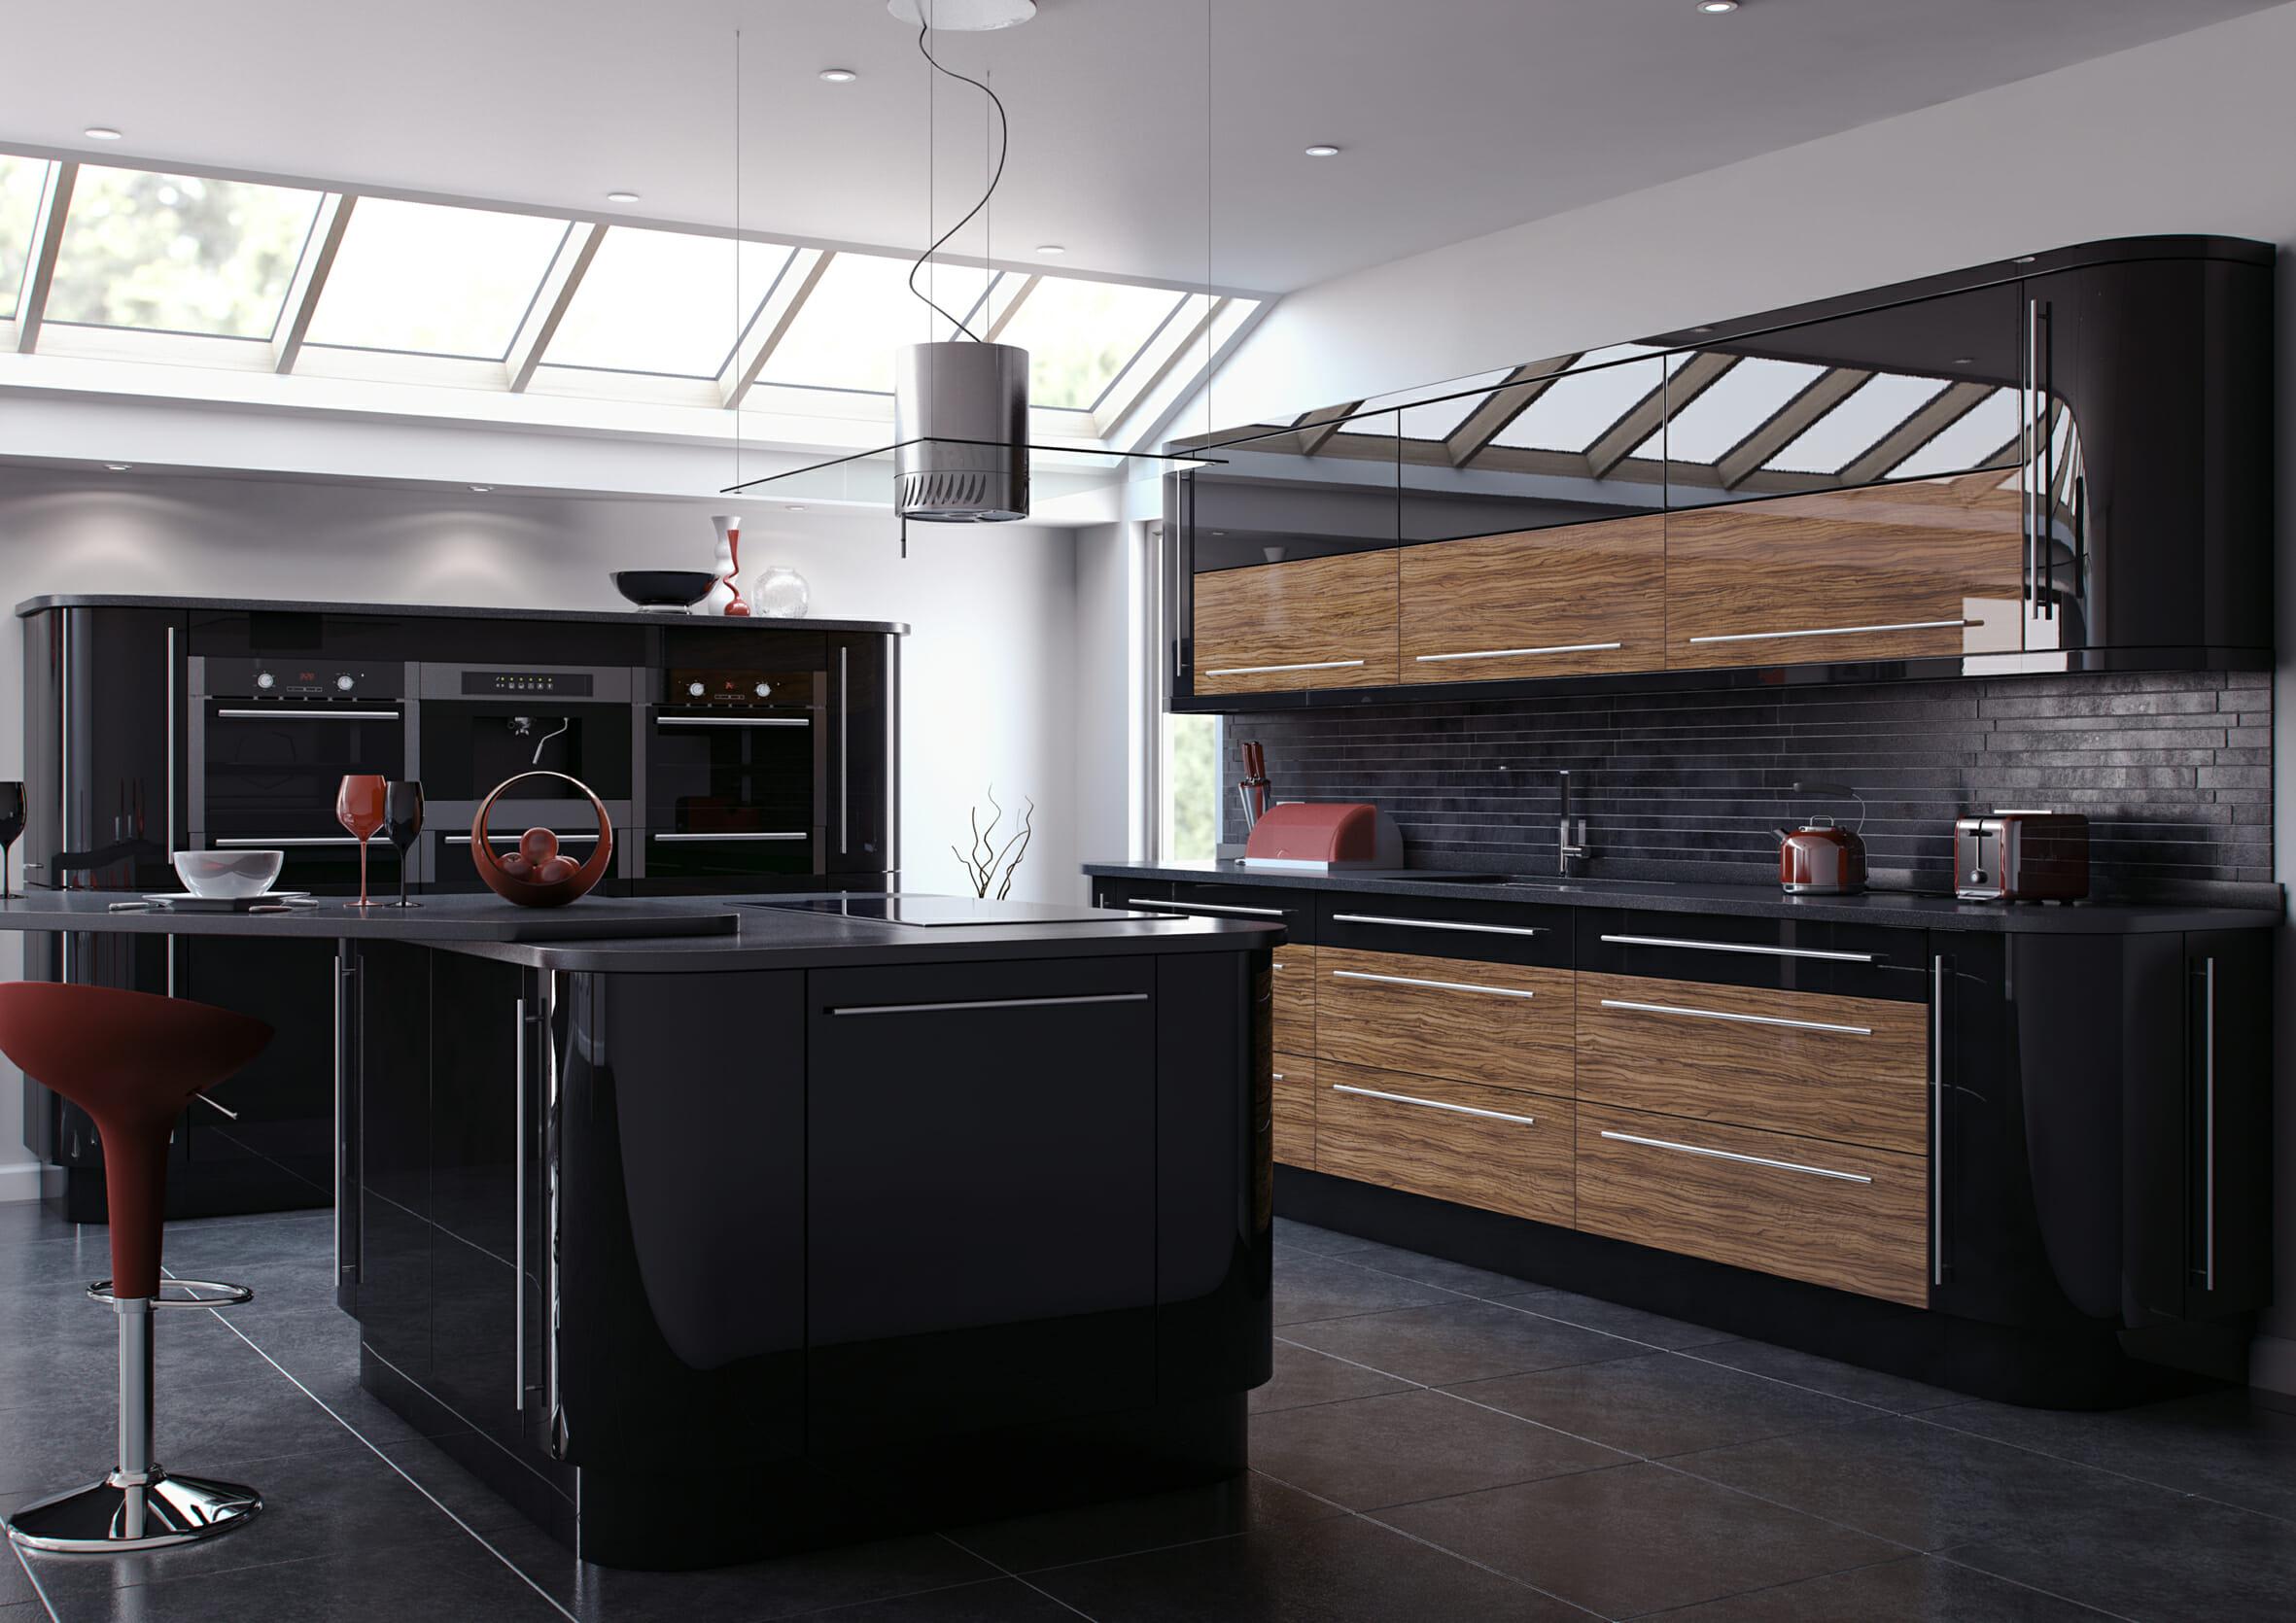 High gloss kitchens mastercraft kitchens - Princeton Solid Oak Reflections Black Reflections Black Olive